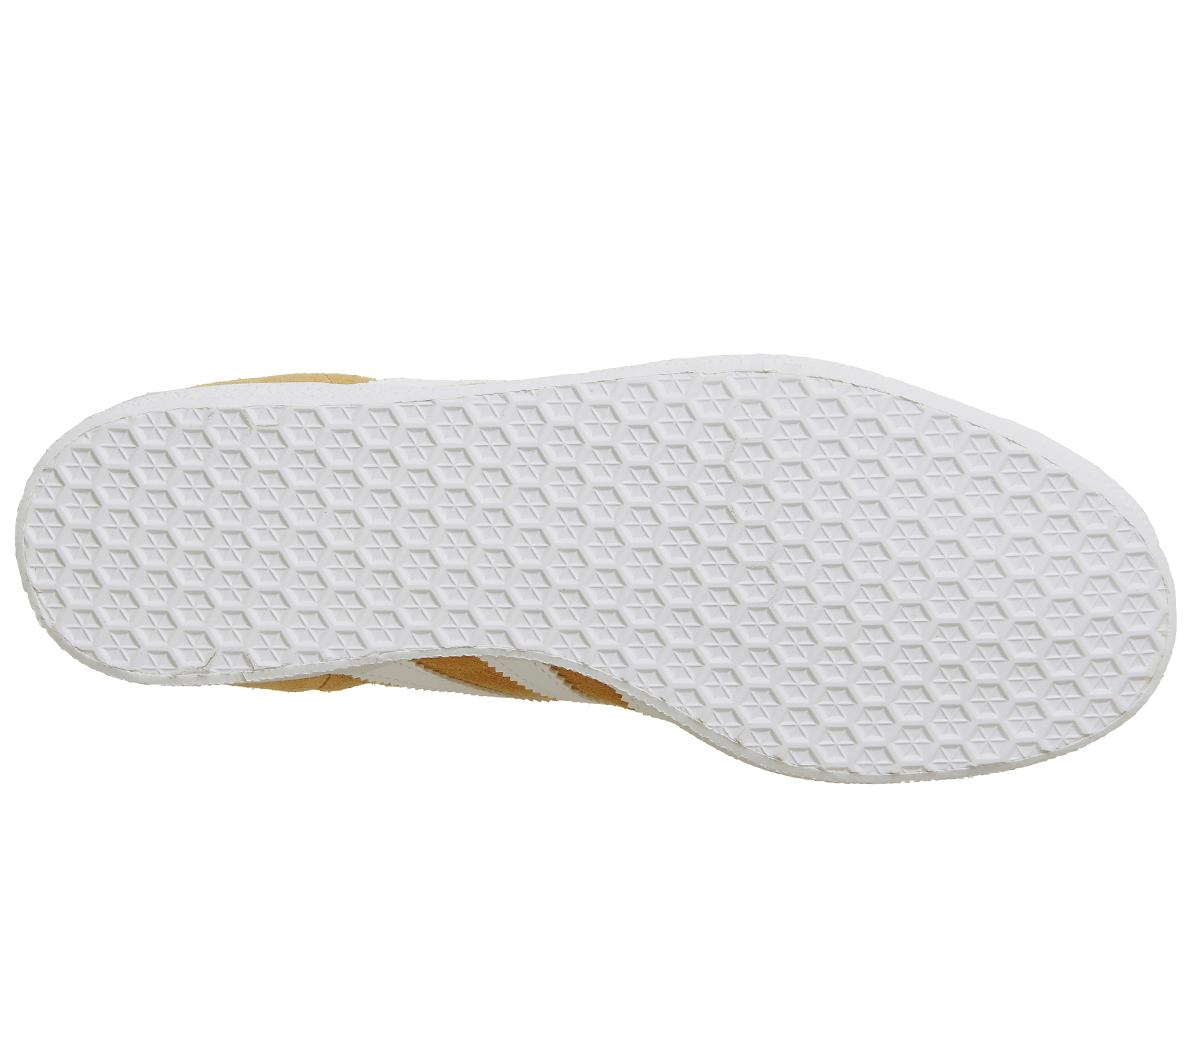 Hommes Adidas Gazelle Trainers MESA blanc  Trainers Chaussures Chaussures Chaussures ae6858